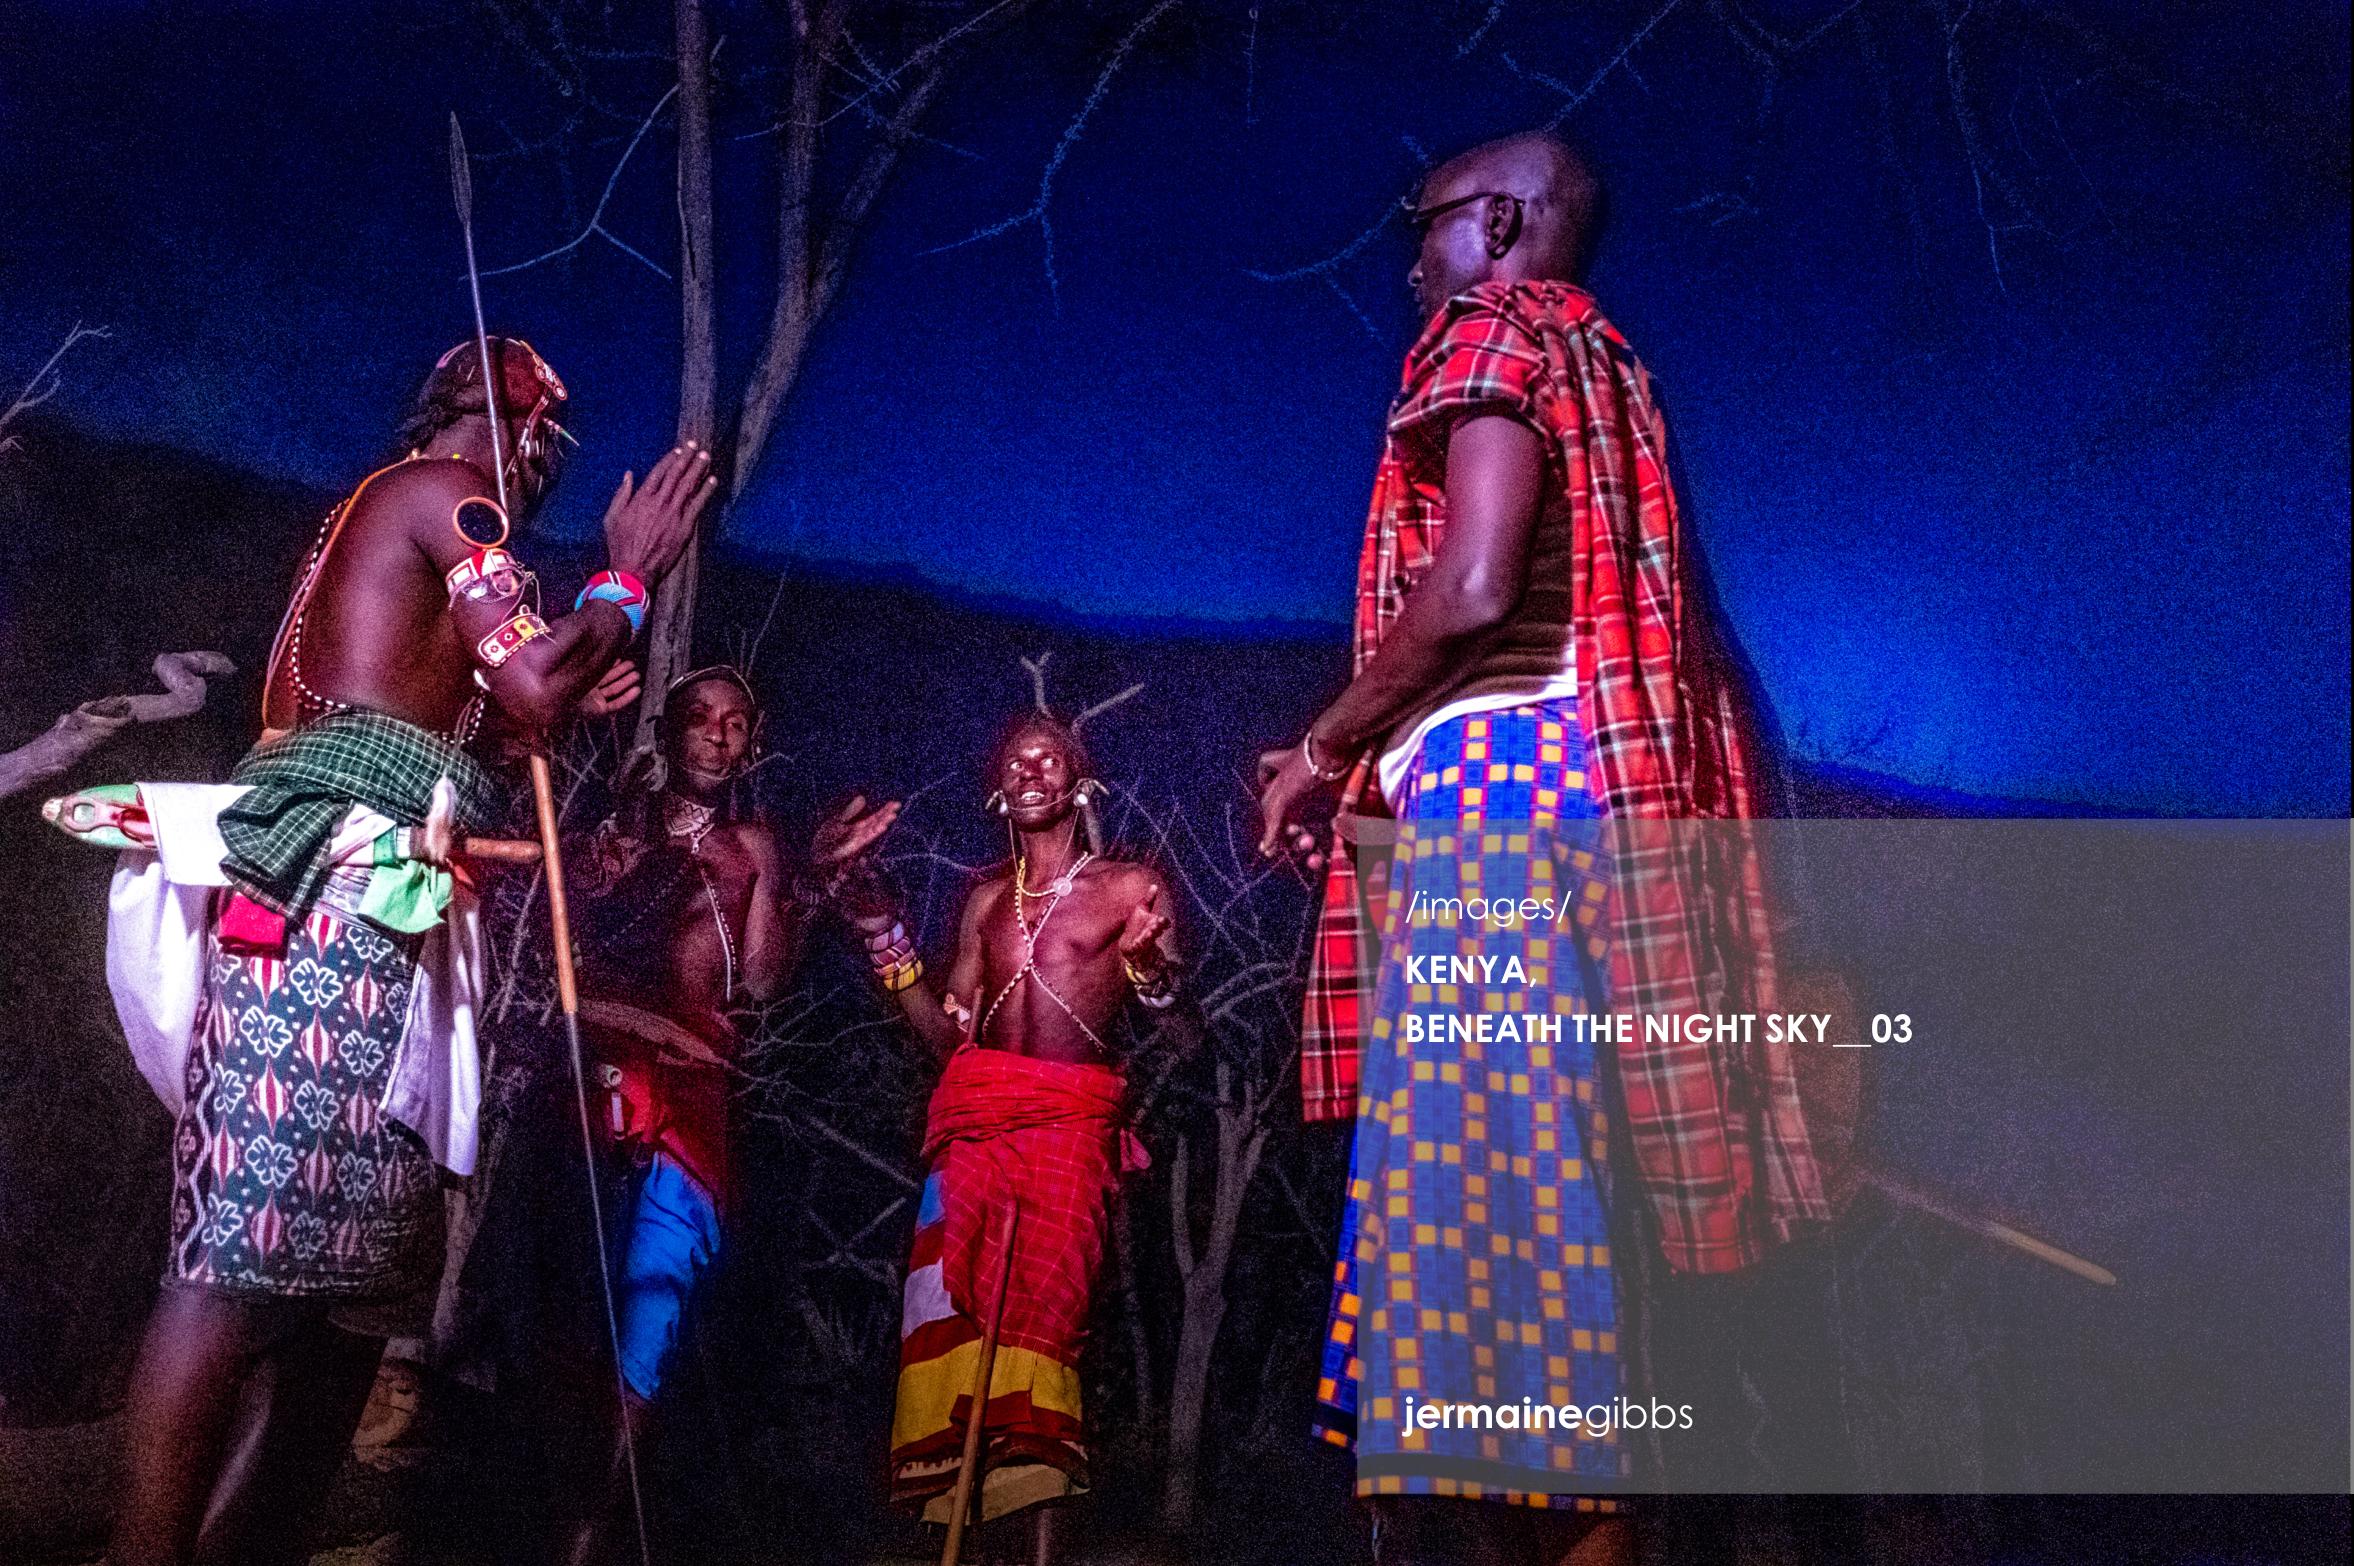 Kenya_Beneath The Night Sky__03